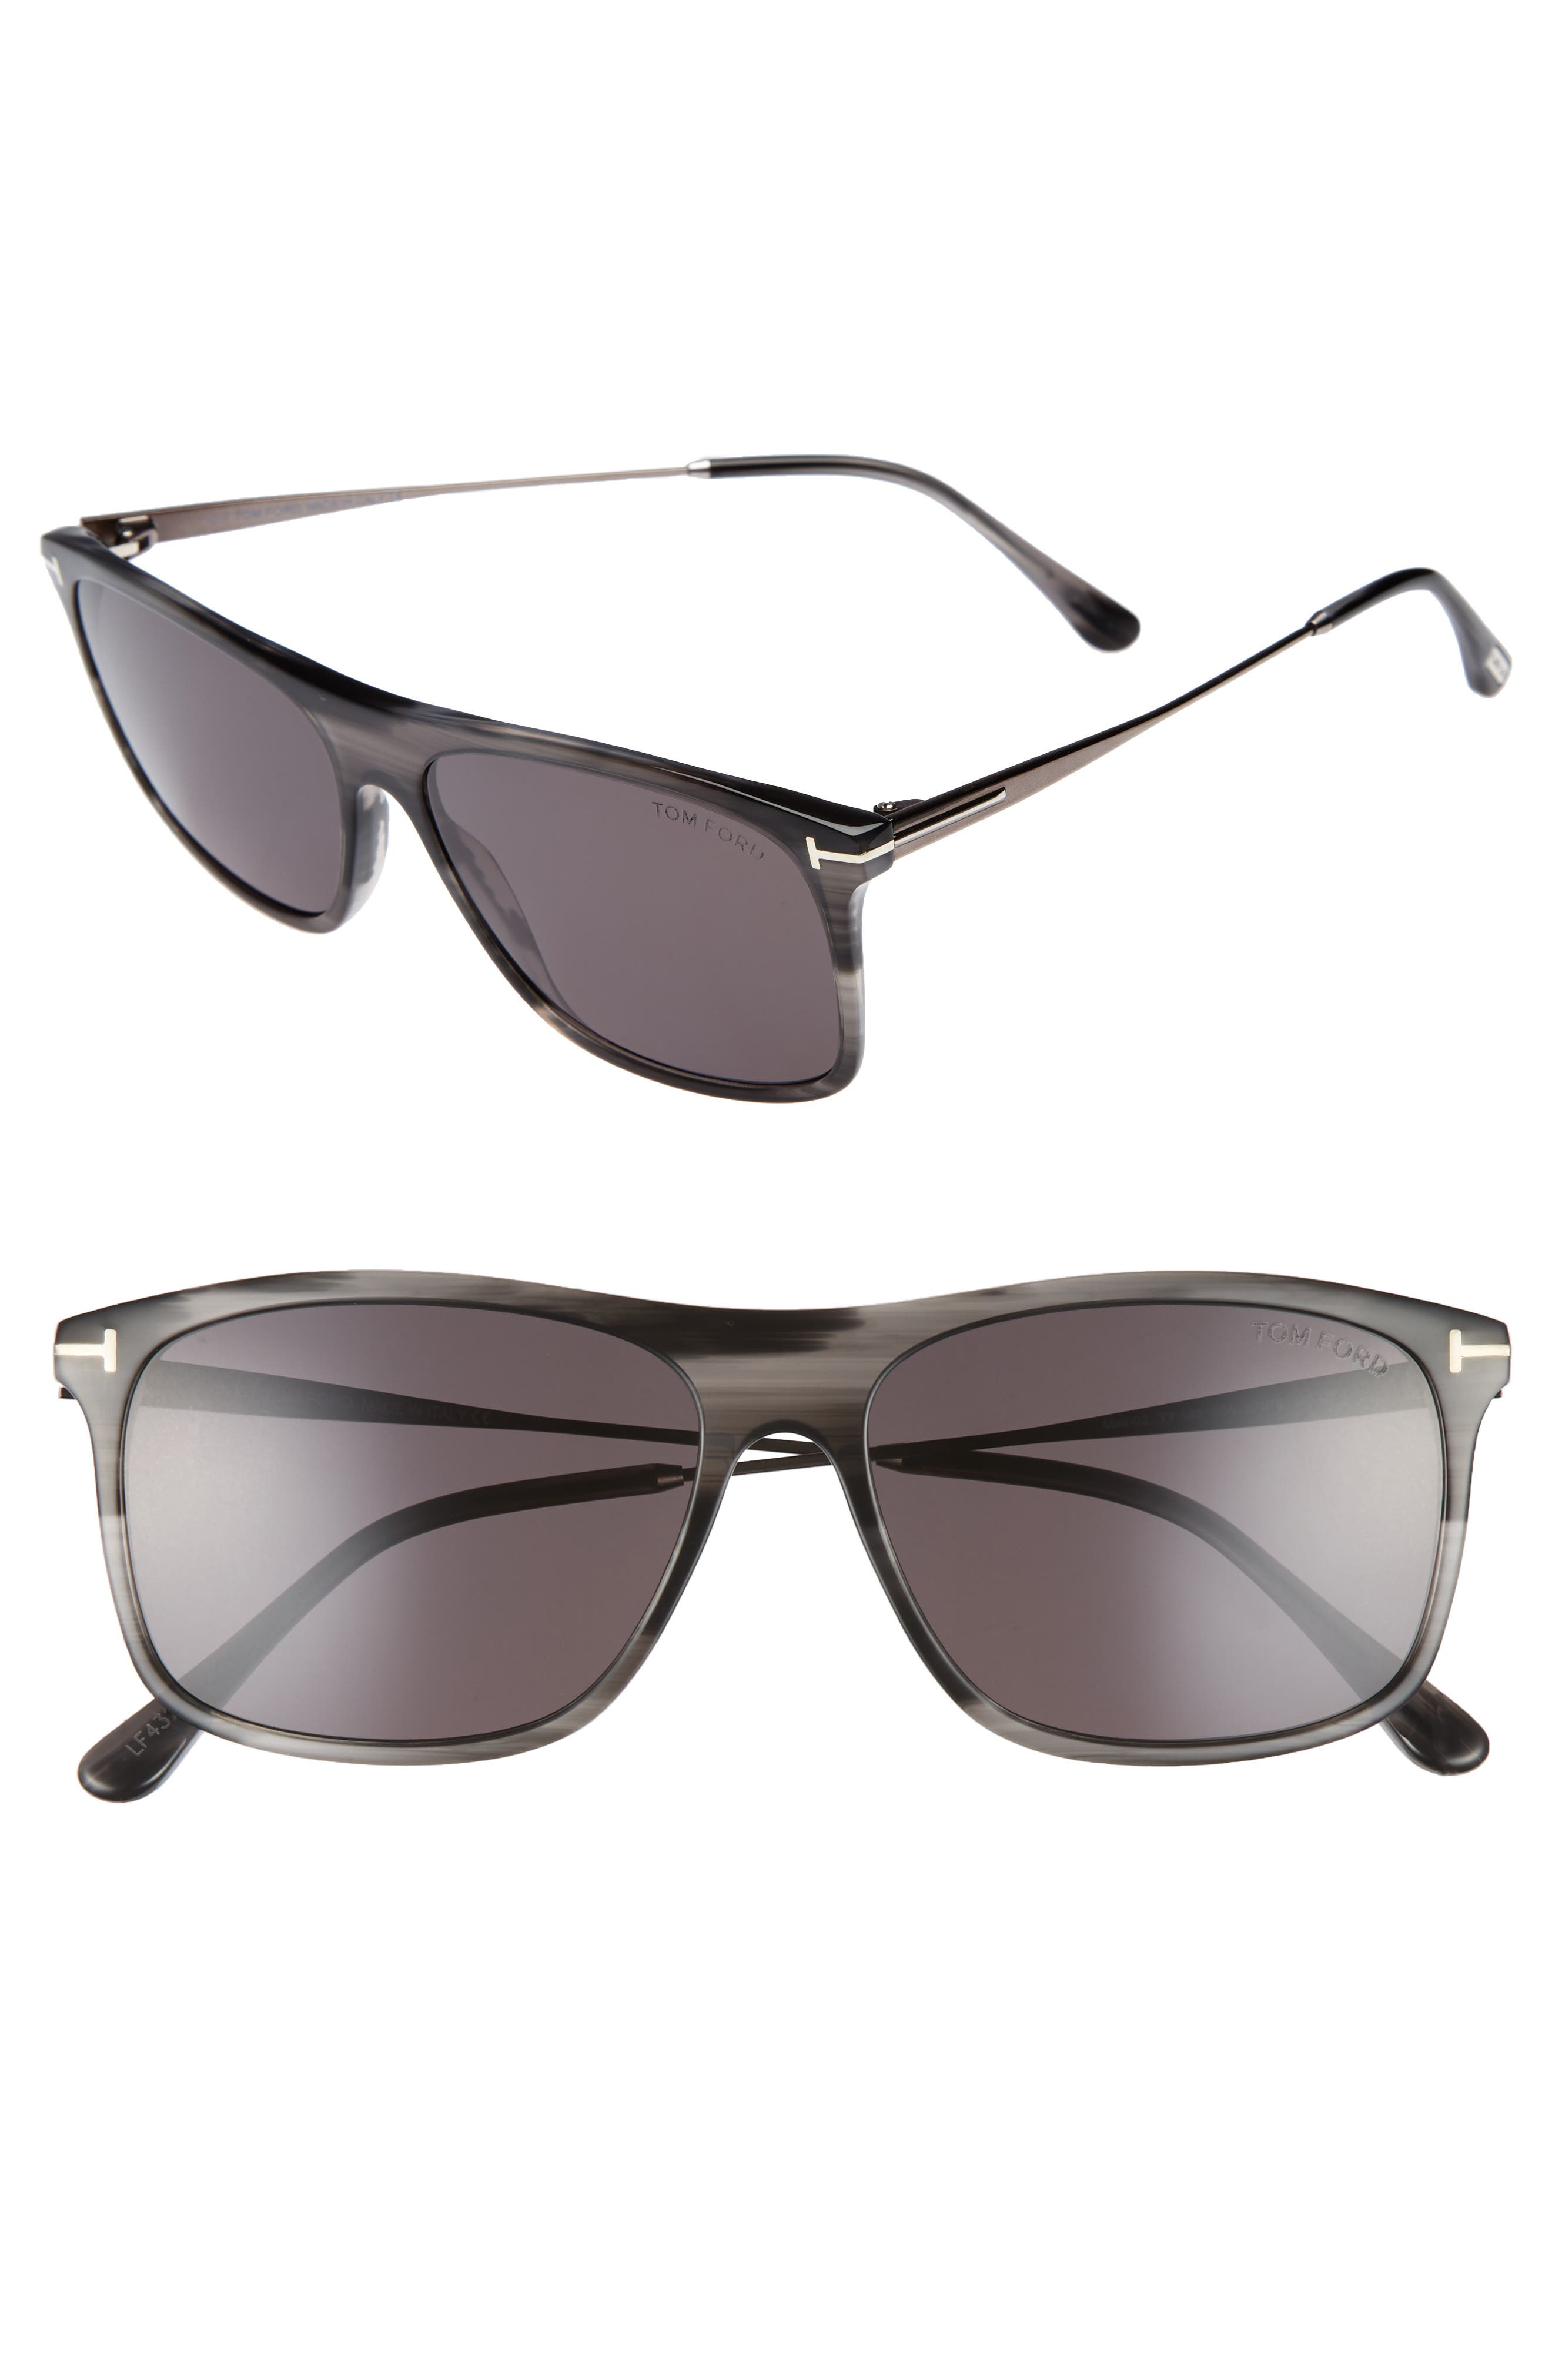 Max 57mm Sunglasses,                         Main,                         color, Grey/ Black/ Ruthenium/ Smoke